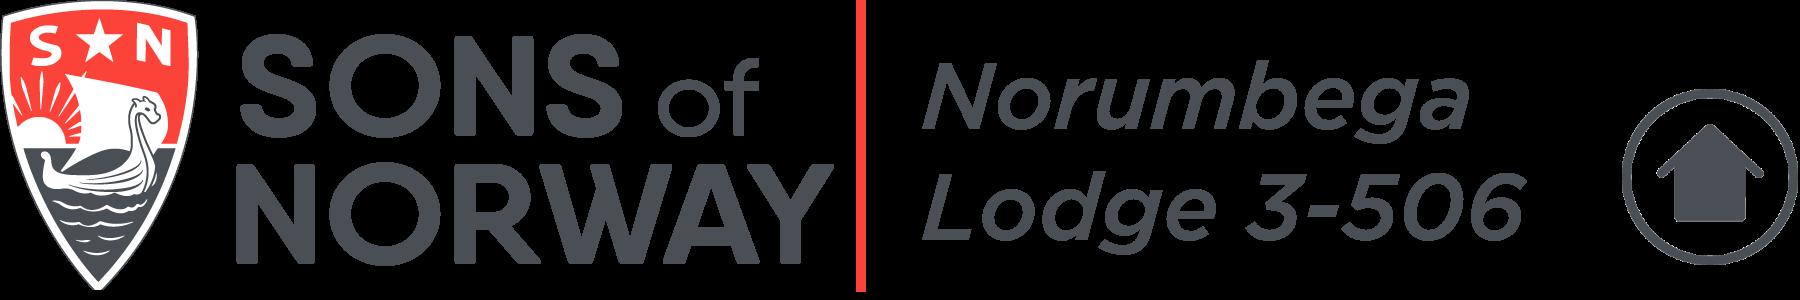 Norumbega Lodge 3-506